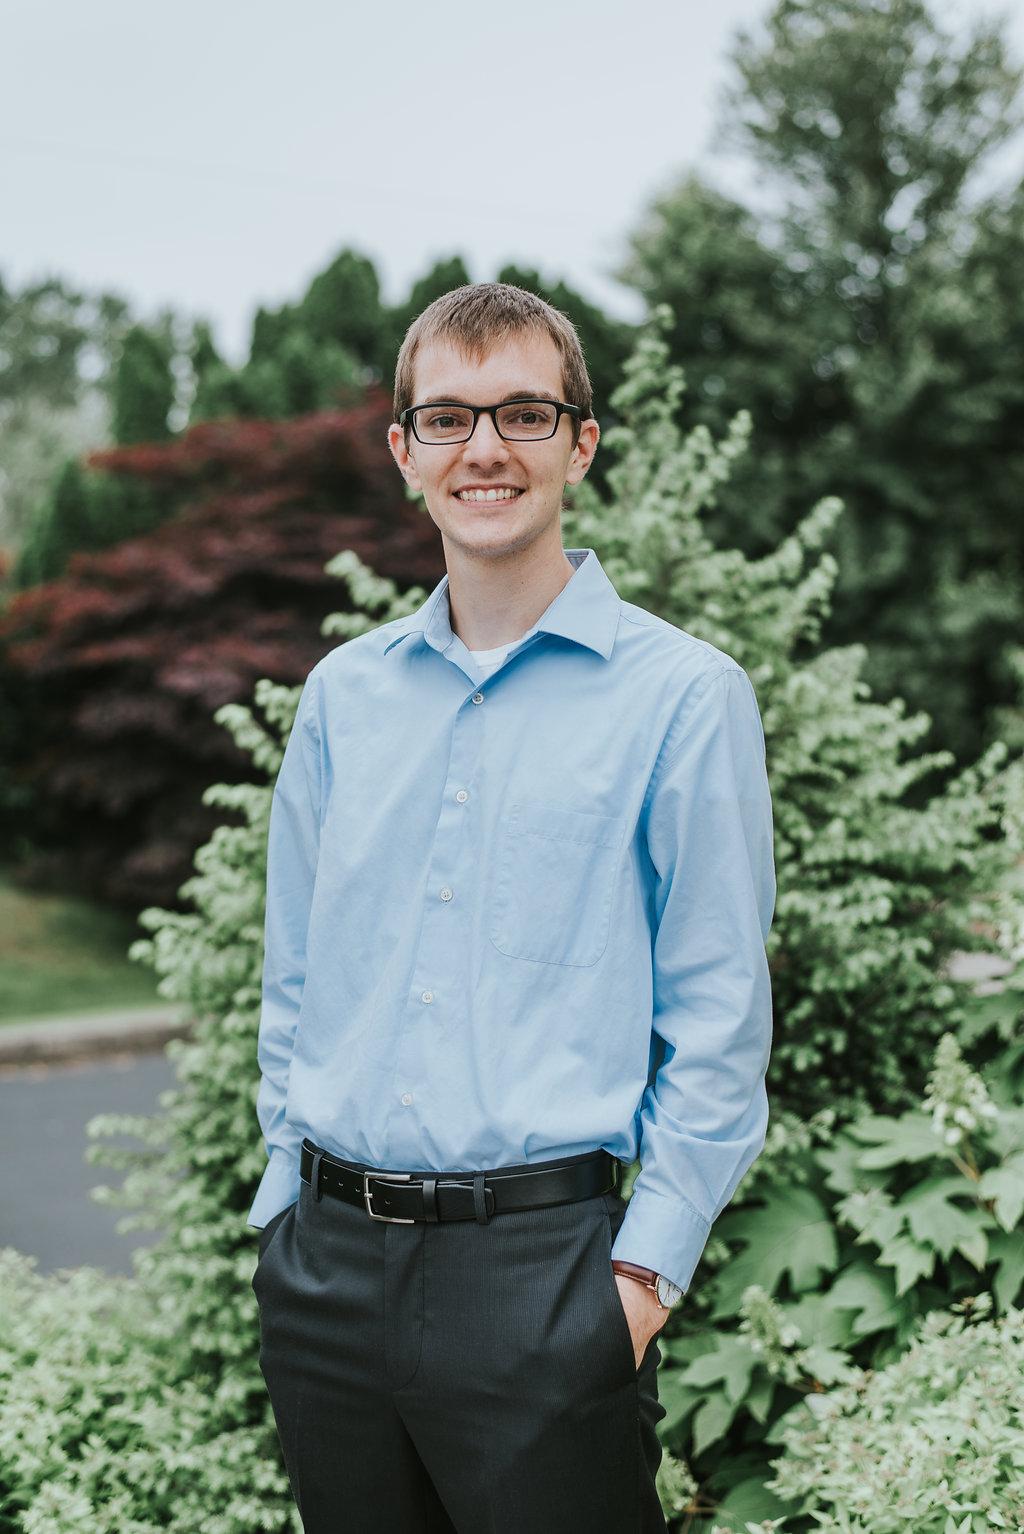 Matthew L. Hess, CFP®'s profile image